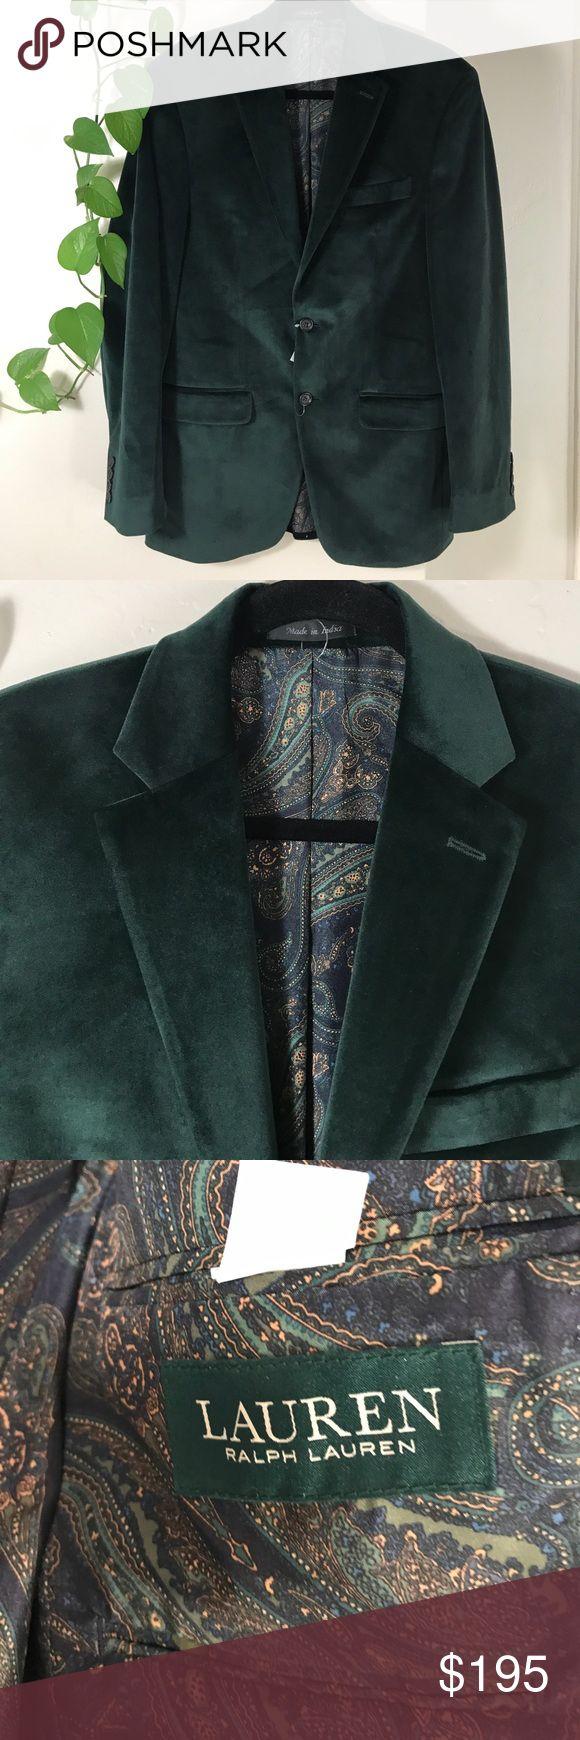 "Lauren Ralph Lauren Green Velvet Sport Coat. Lauren Ralph Lauren Green Velvet Sport Coat.  B109. 21"" across armpit to armpit 31"" long. Sleeve 25"" long. Lauren Ralph Lauren Suits & Blazers Sport Coats & Blazers"